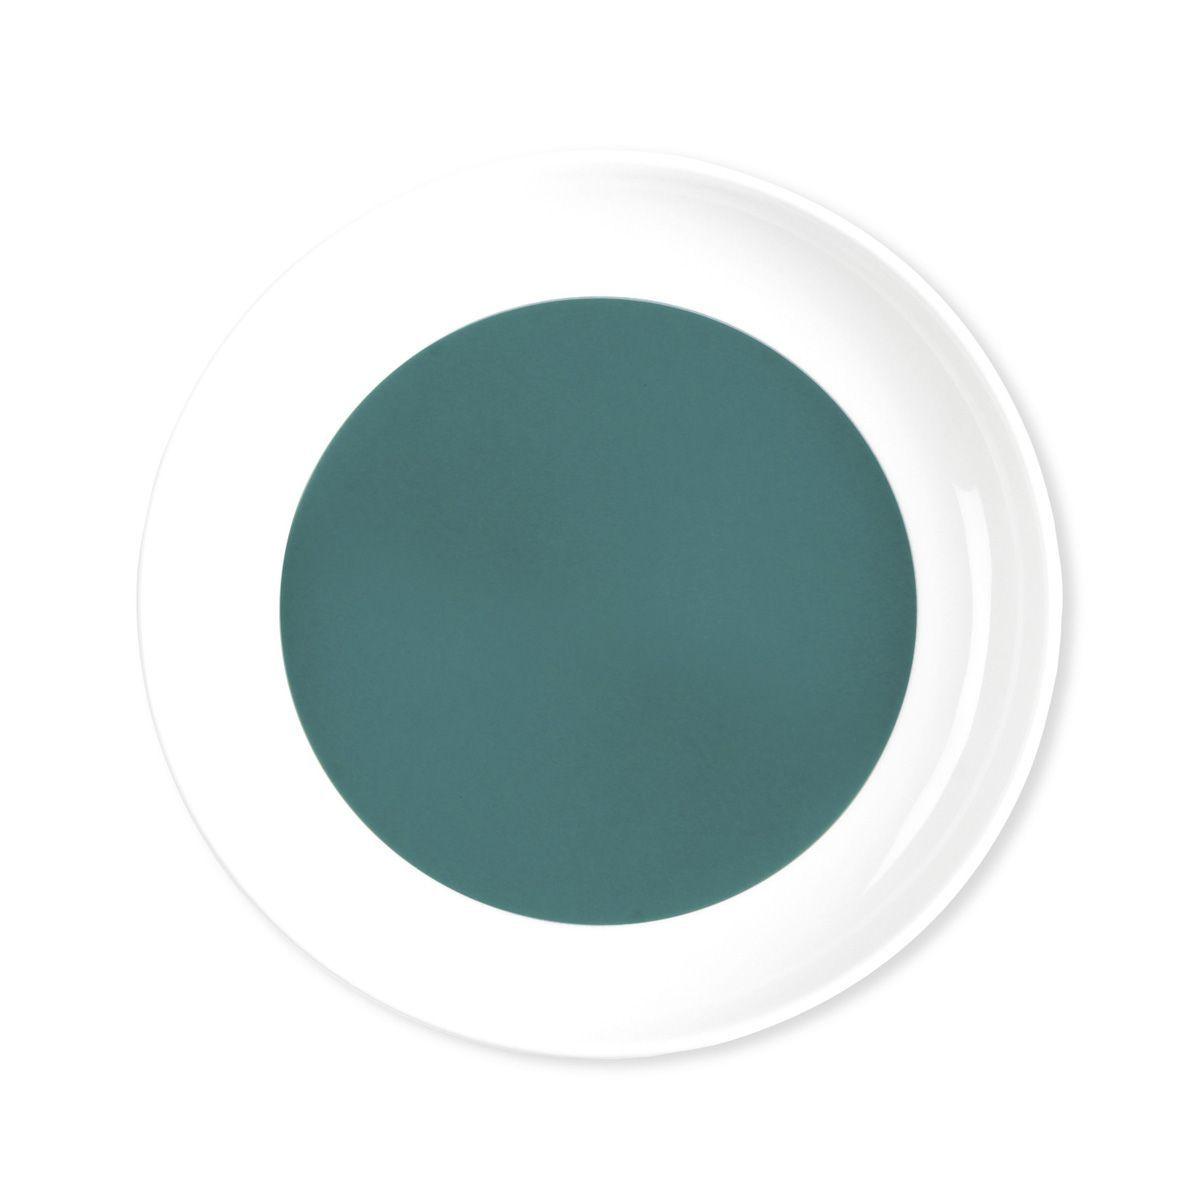 assiette dessert porcelaine louison bleu canard. Black Bedroom Furniture Sets. Home Design Ideas